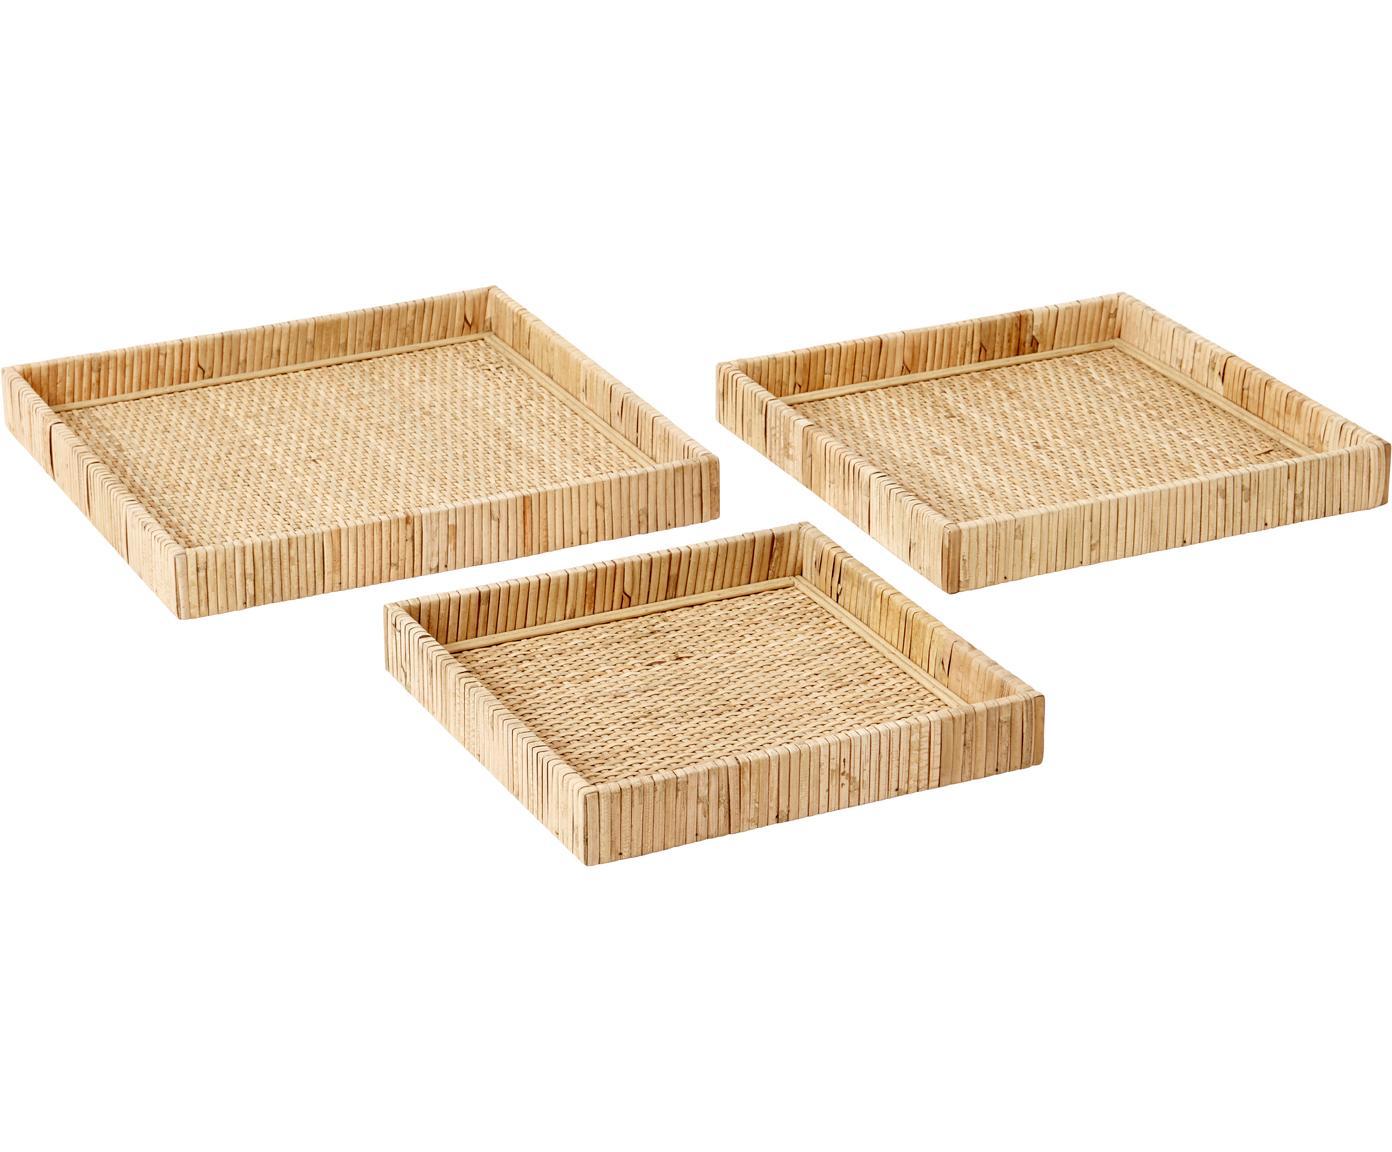 Rattan-Tablett Fuji, 3er-Set, Rattan, Sperrholz, Rattan, Sondergrößen